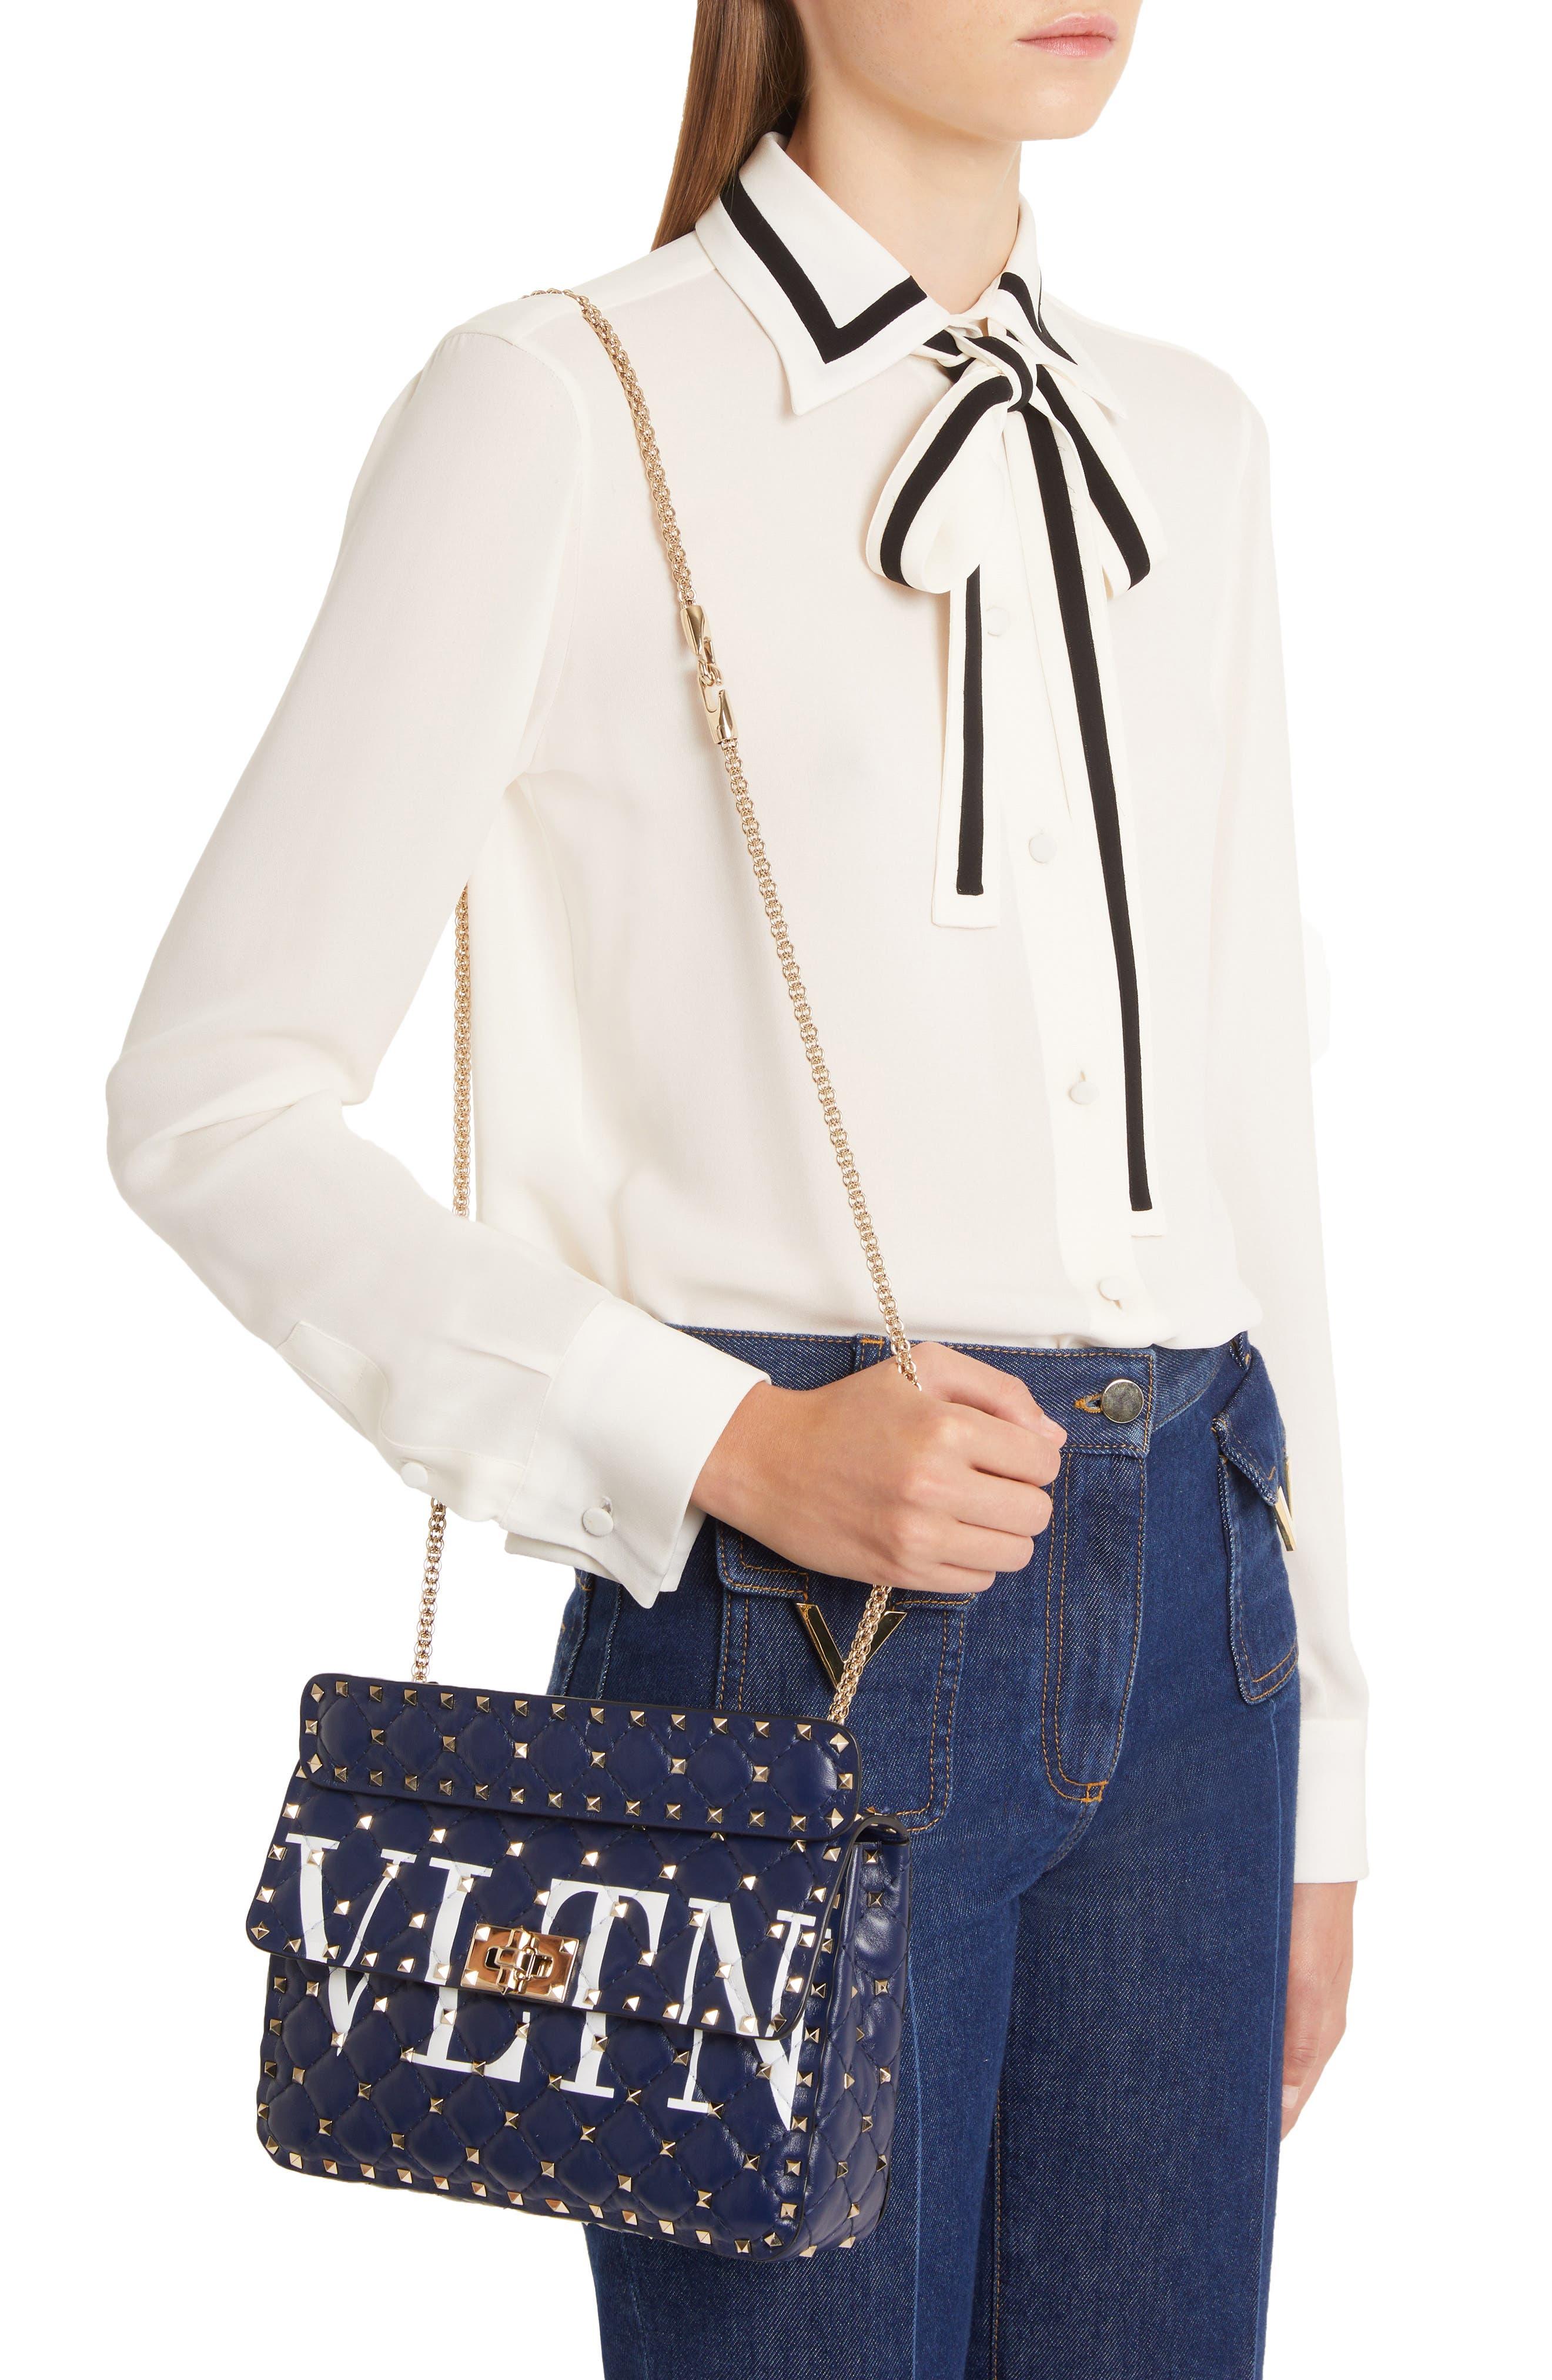 Medium Spike.It VLTN Logo Leather Shoulder Bag,                             Alternate thumbnail 2, color,                             PURE BLUE/ BIANCO OTTICO